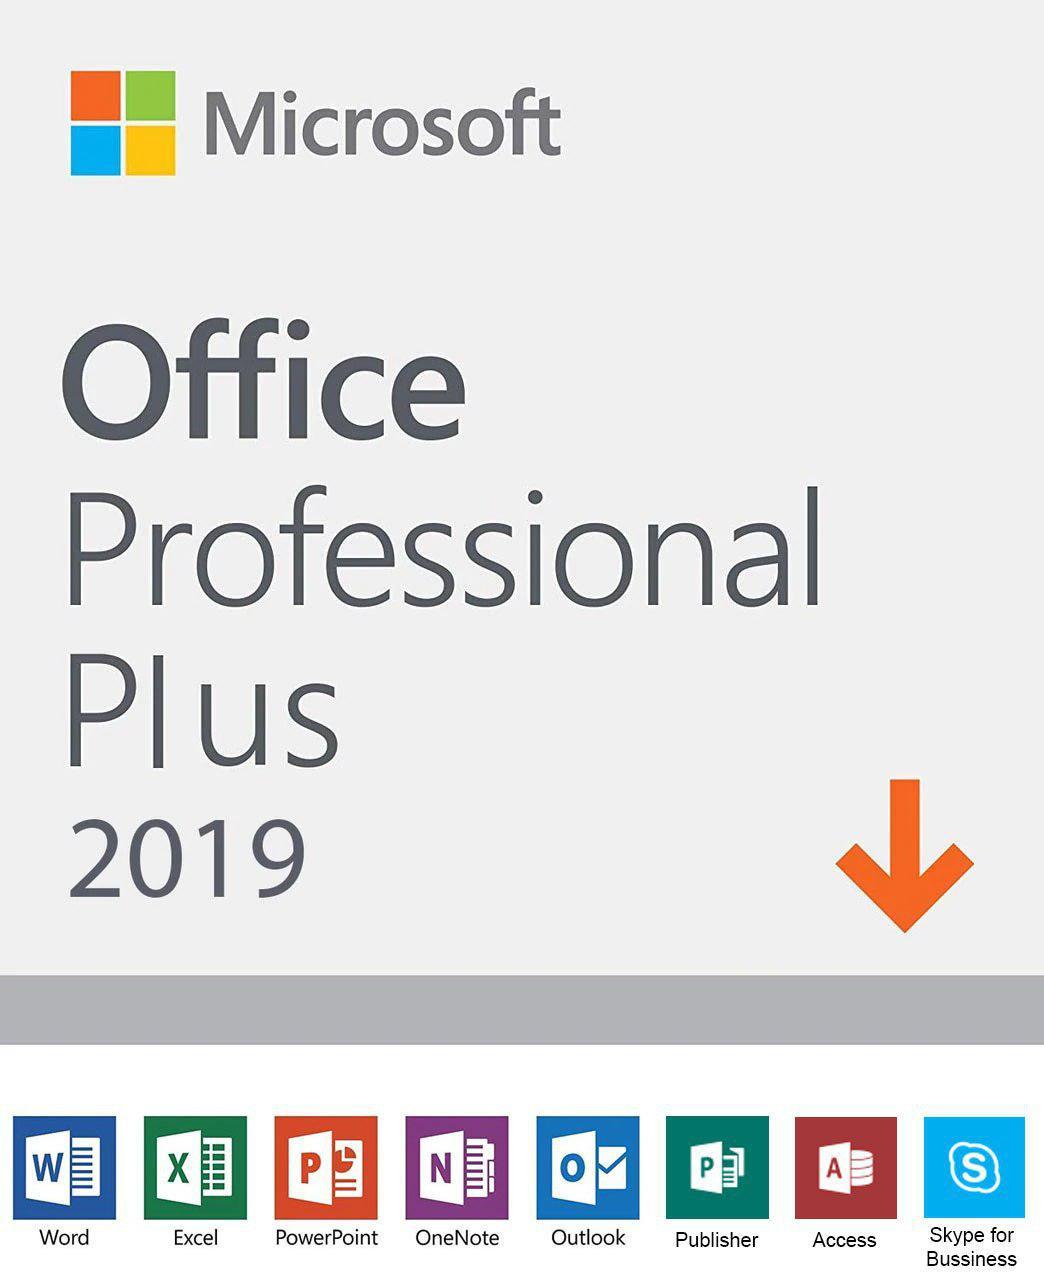 Microsoft Office 2019 Professional Plus, Full Retail Version for 1 PC,  Windows 10